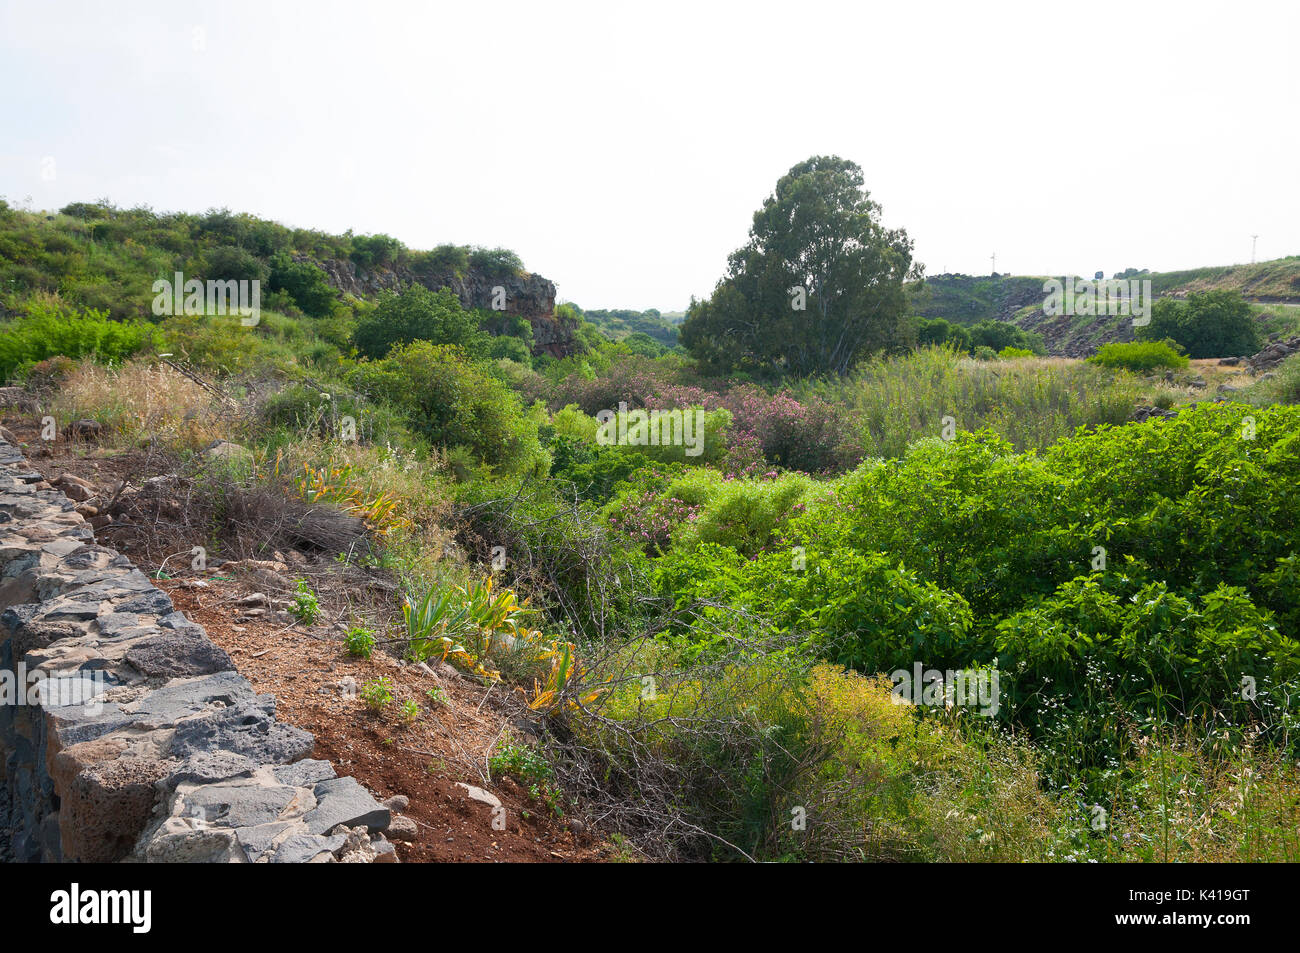 Zavit stream, Eitan stream - Stock Image